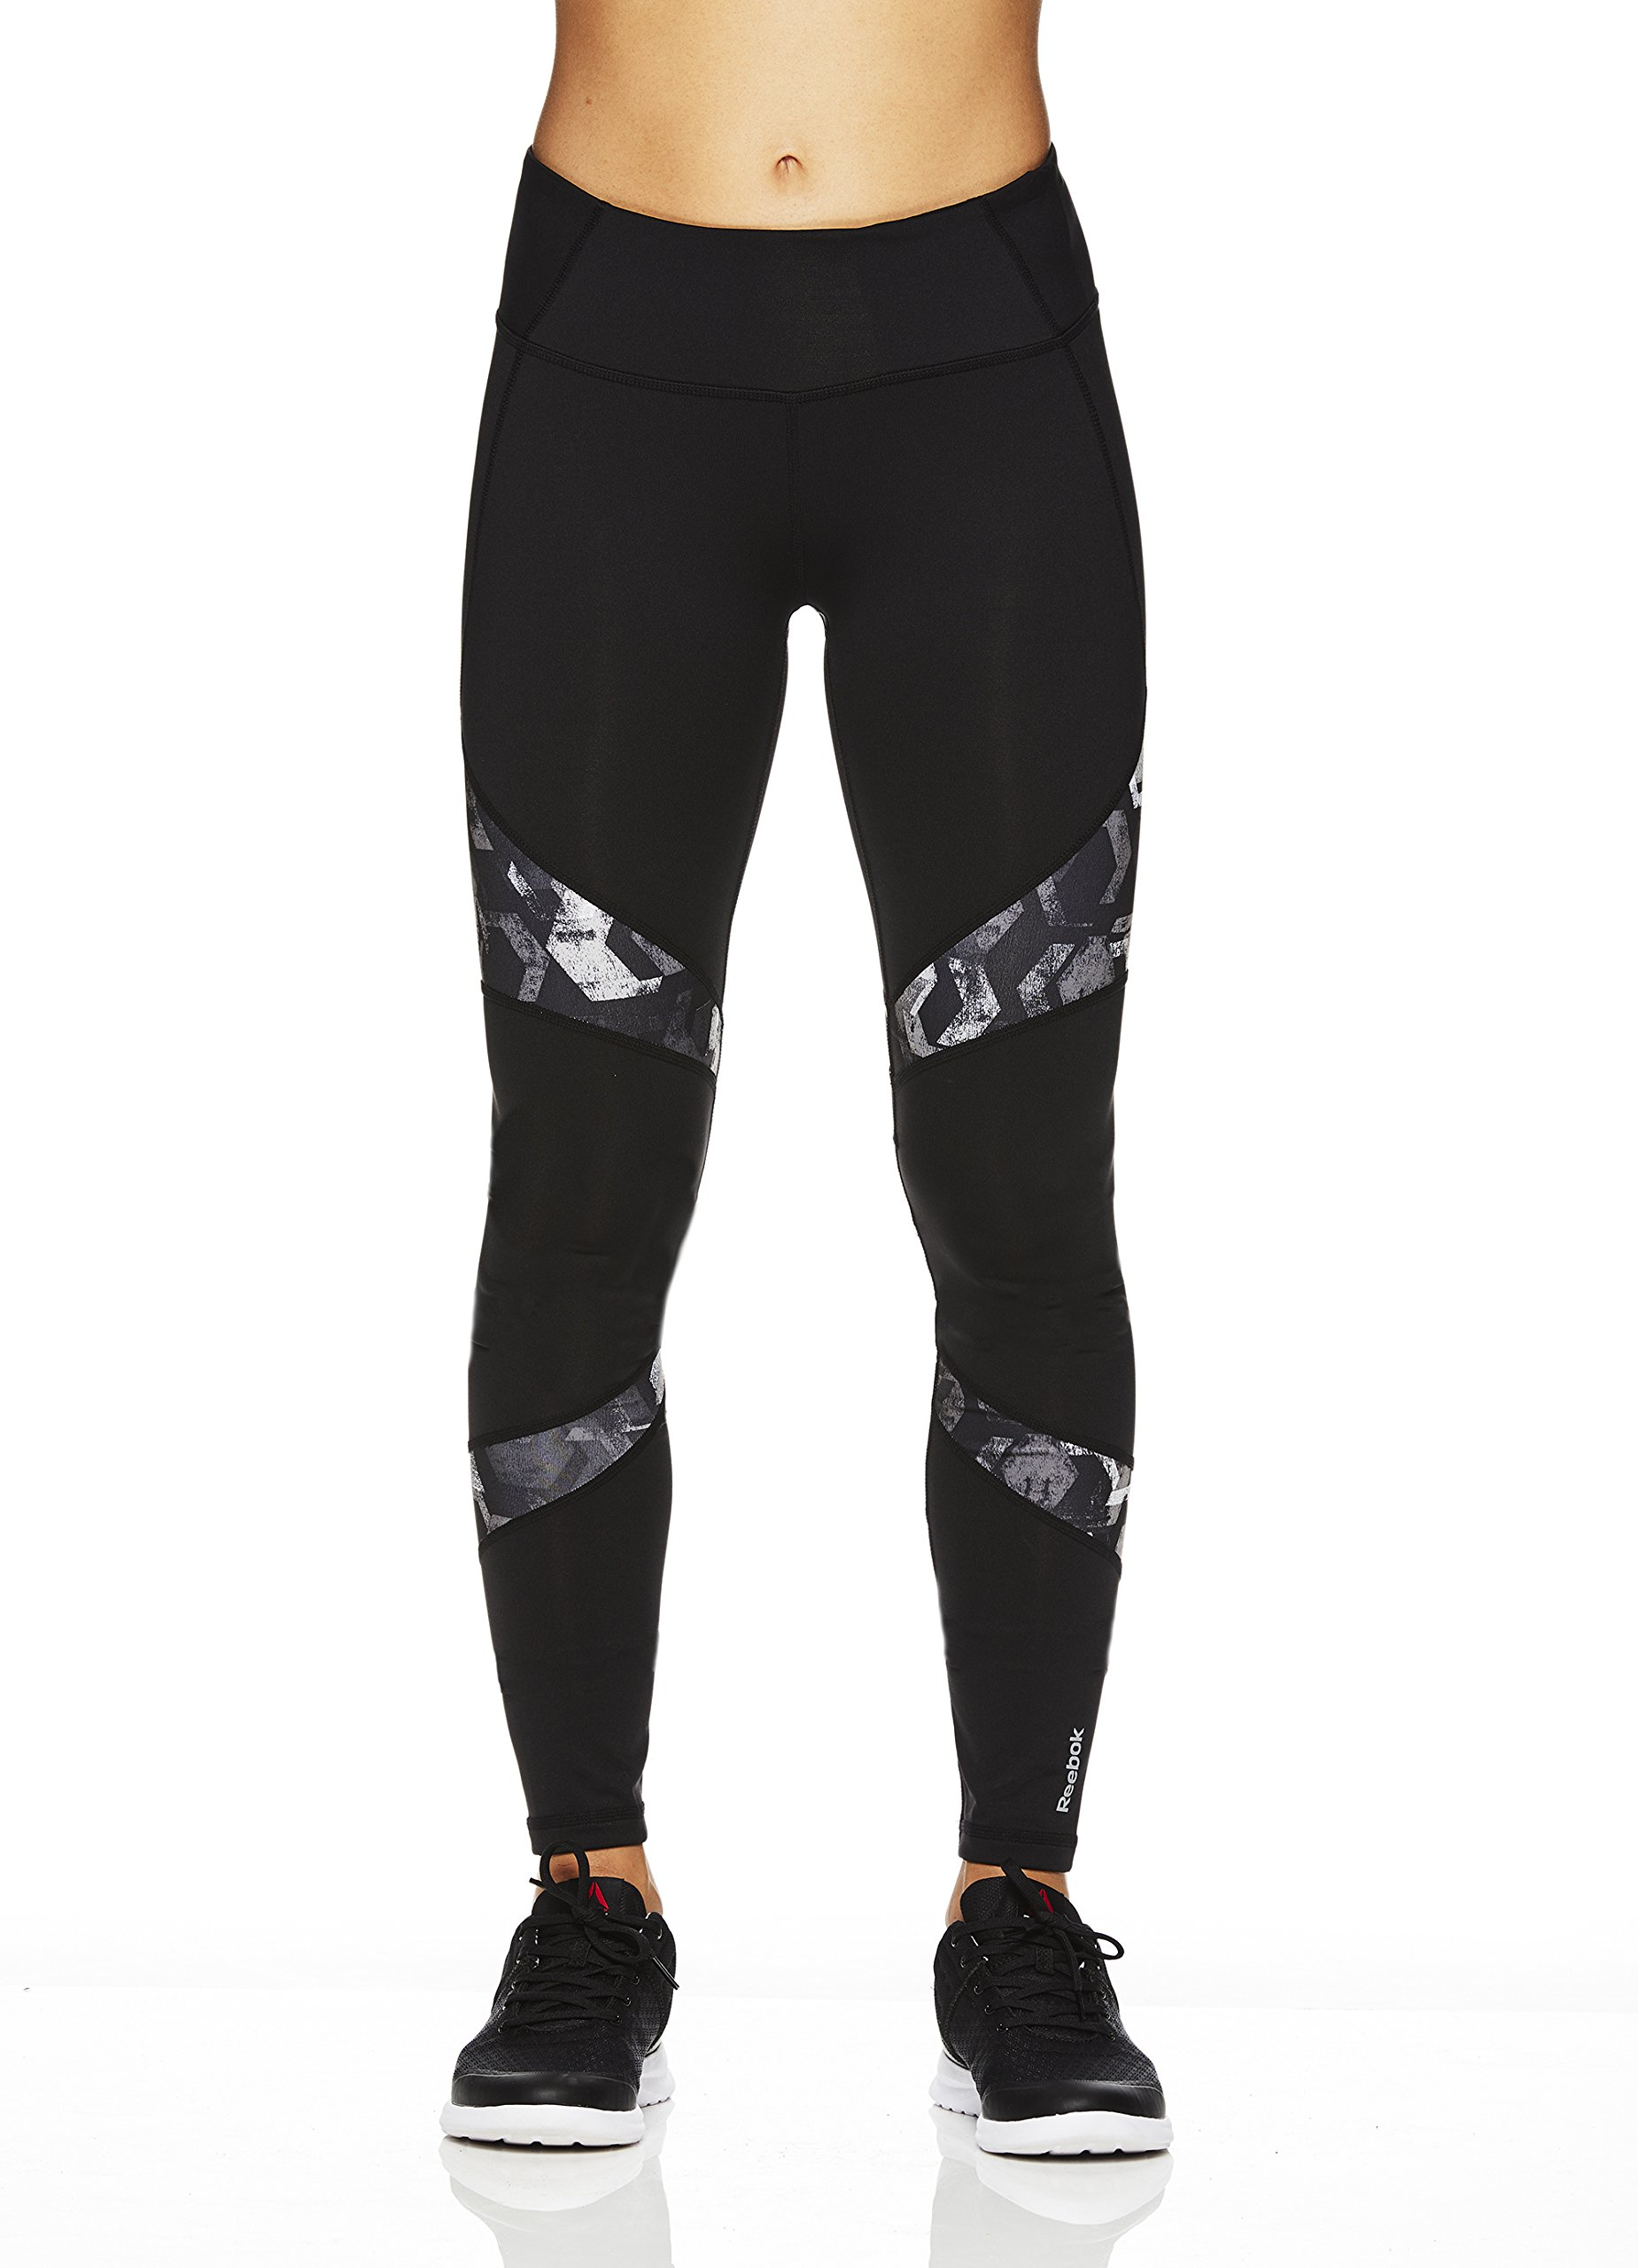 Reebok Women's Legging Full Length Performance Compression Pants- Black - Reah Printed Doku Geo/Black, Medium